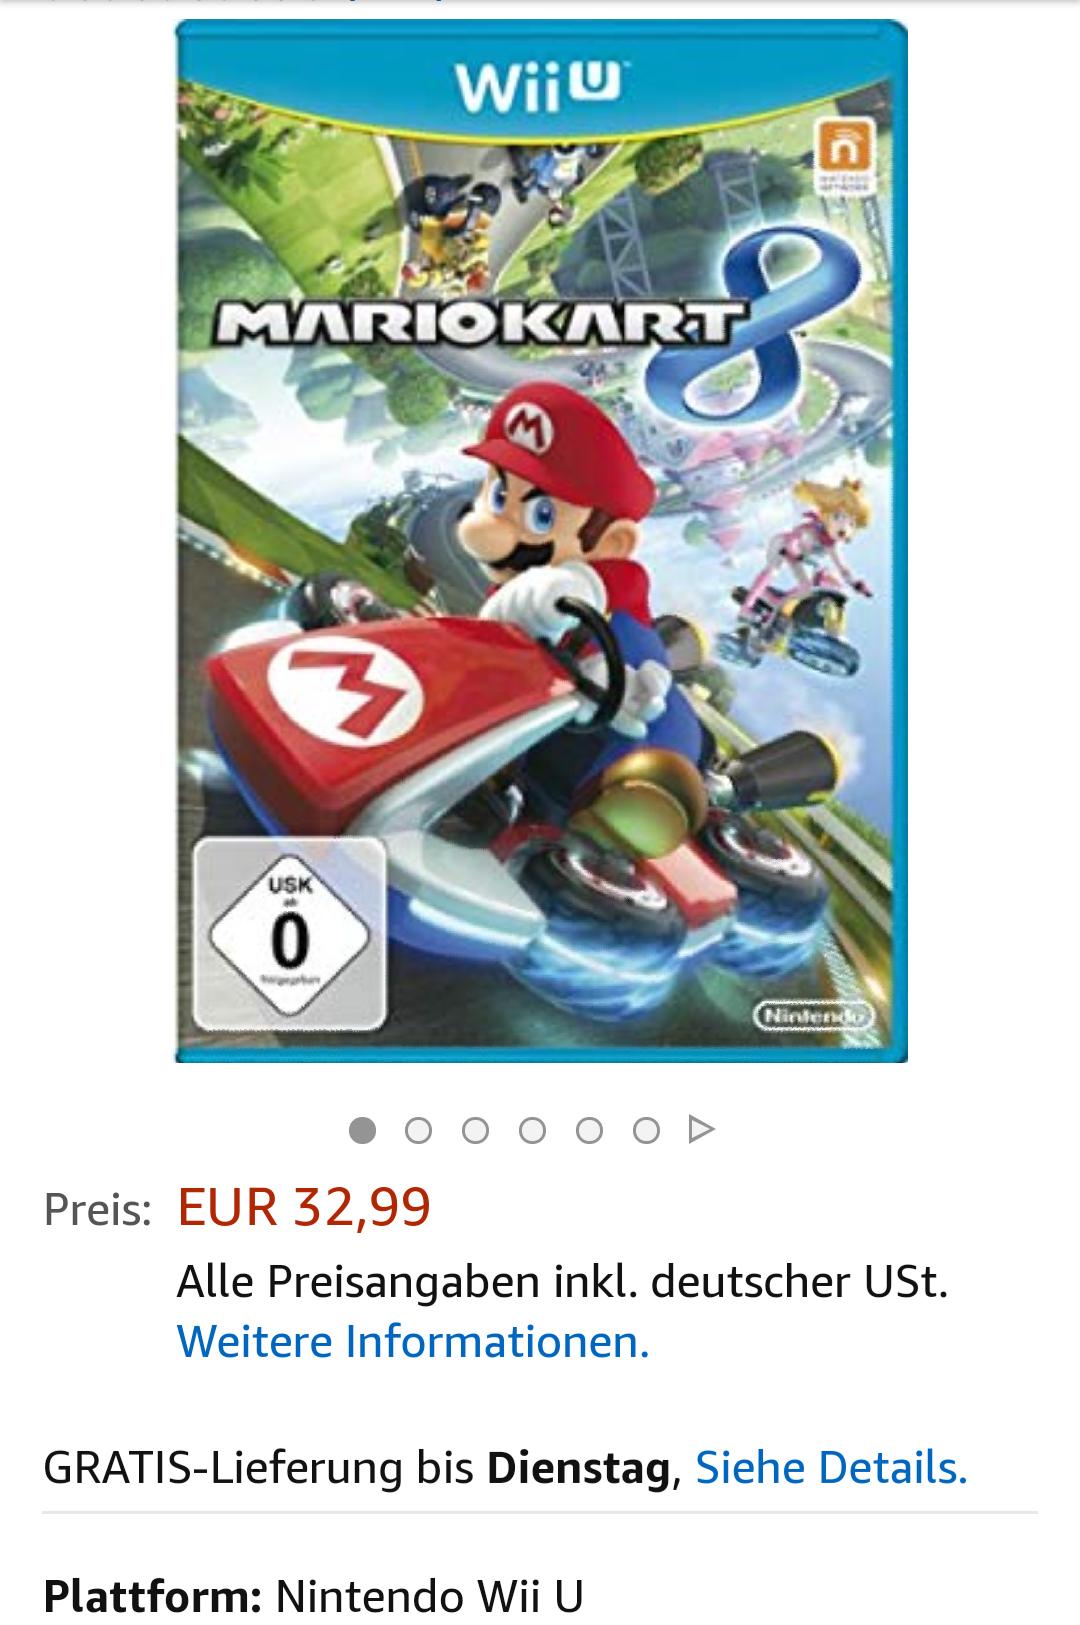 Mario Kart 8 Wii U auf amazon.de